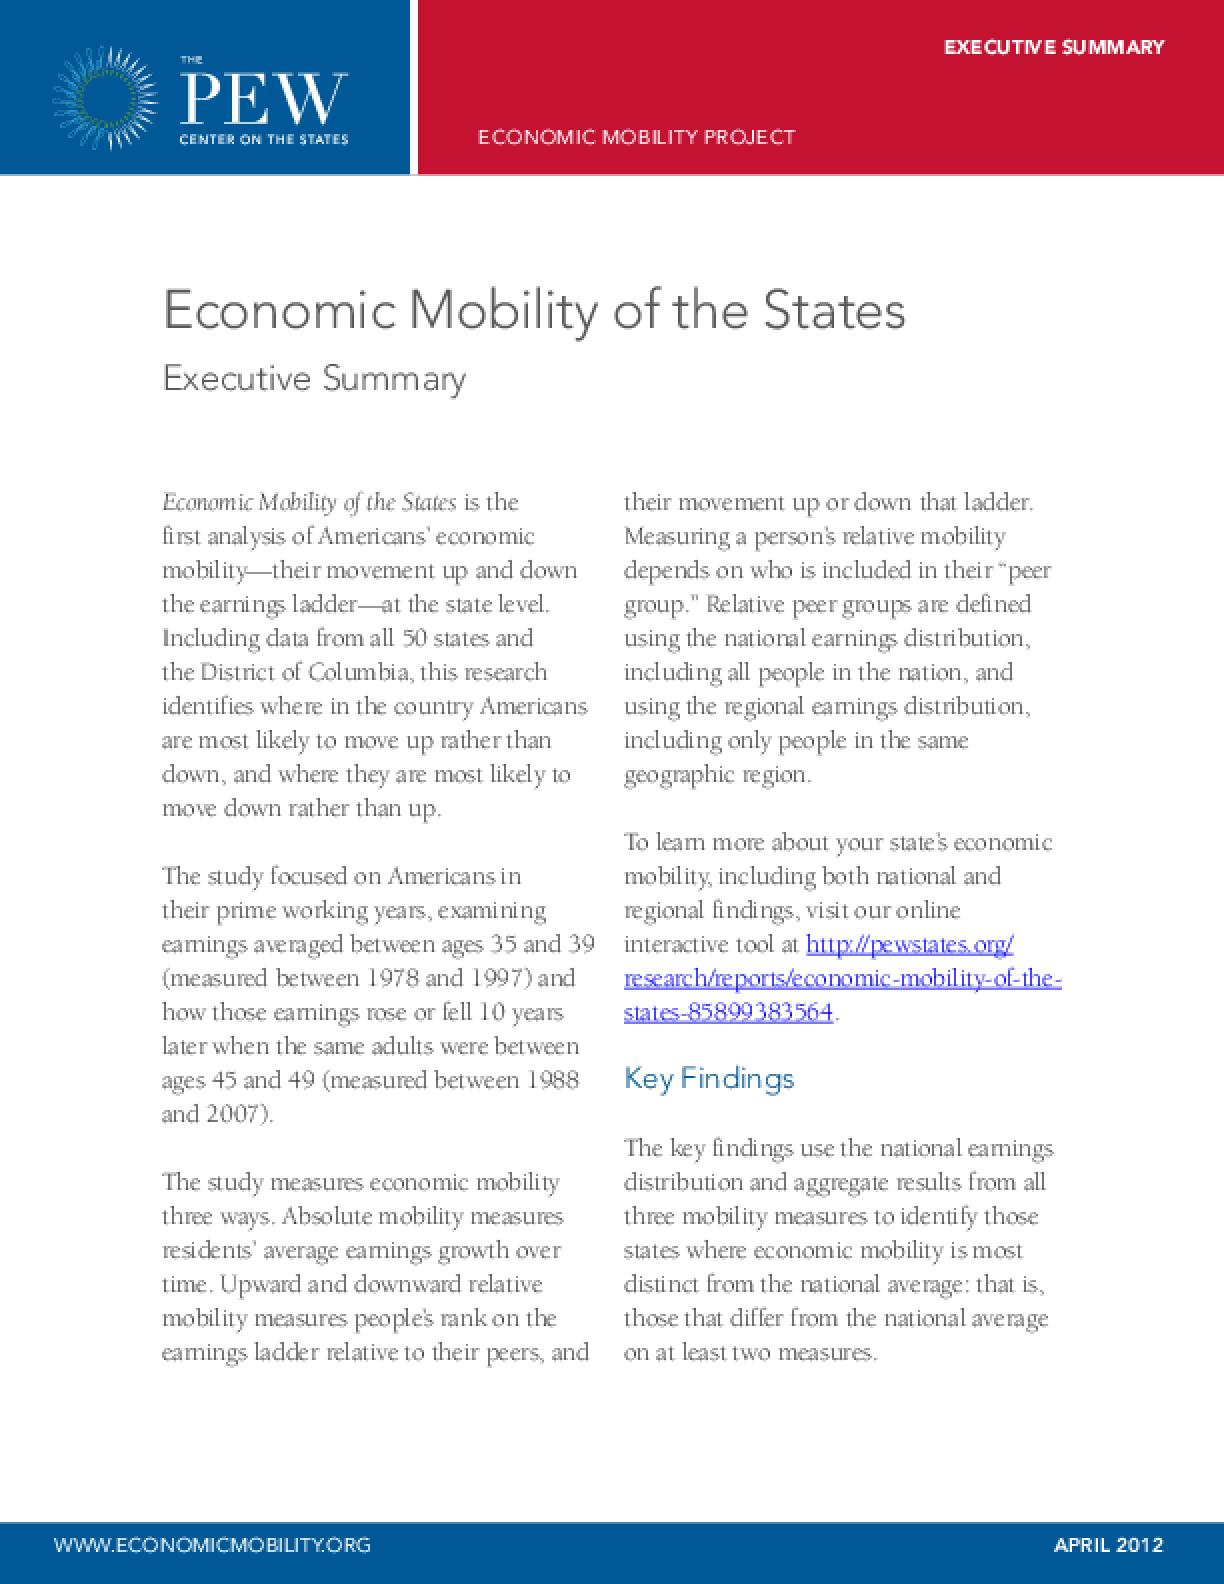 Economic Mobility of the States: Executive Summary